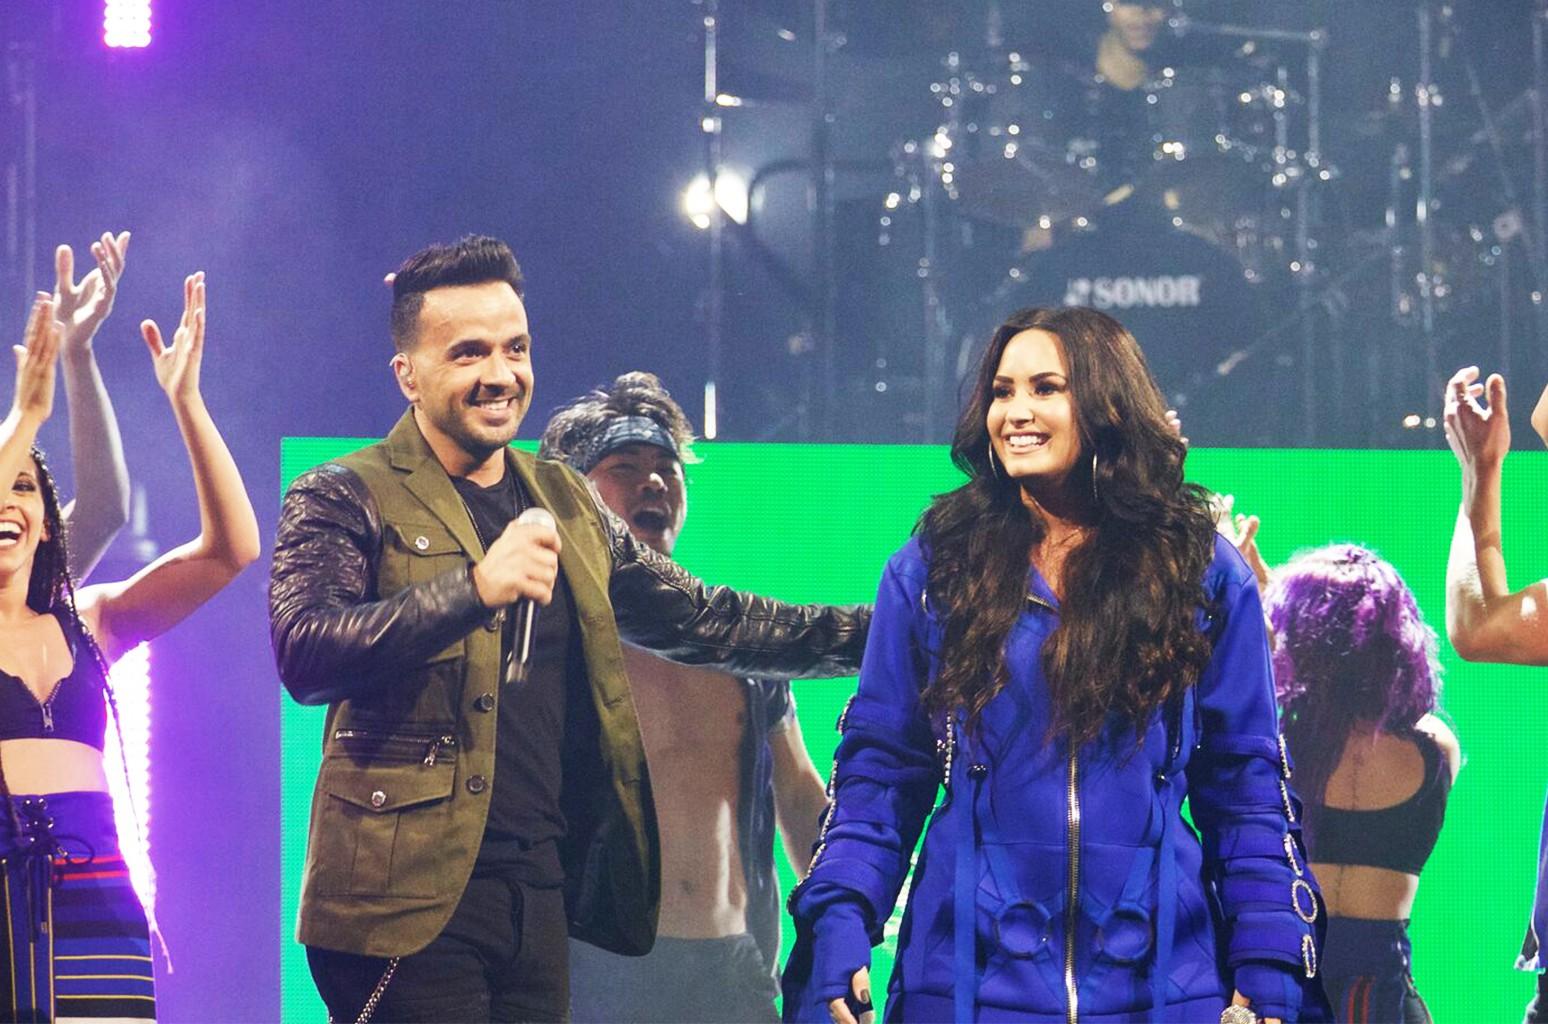 Luis Fonsi and Demi Lovato